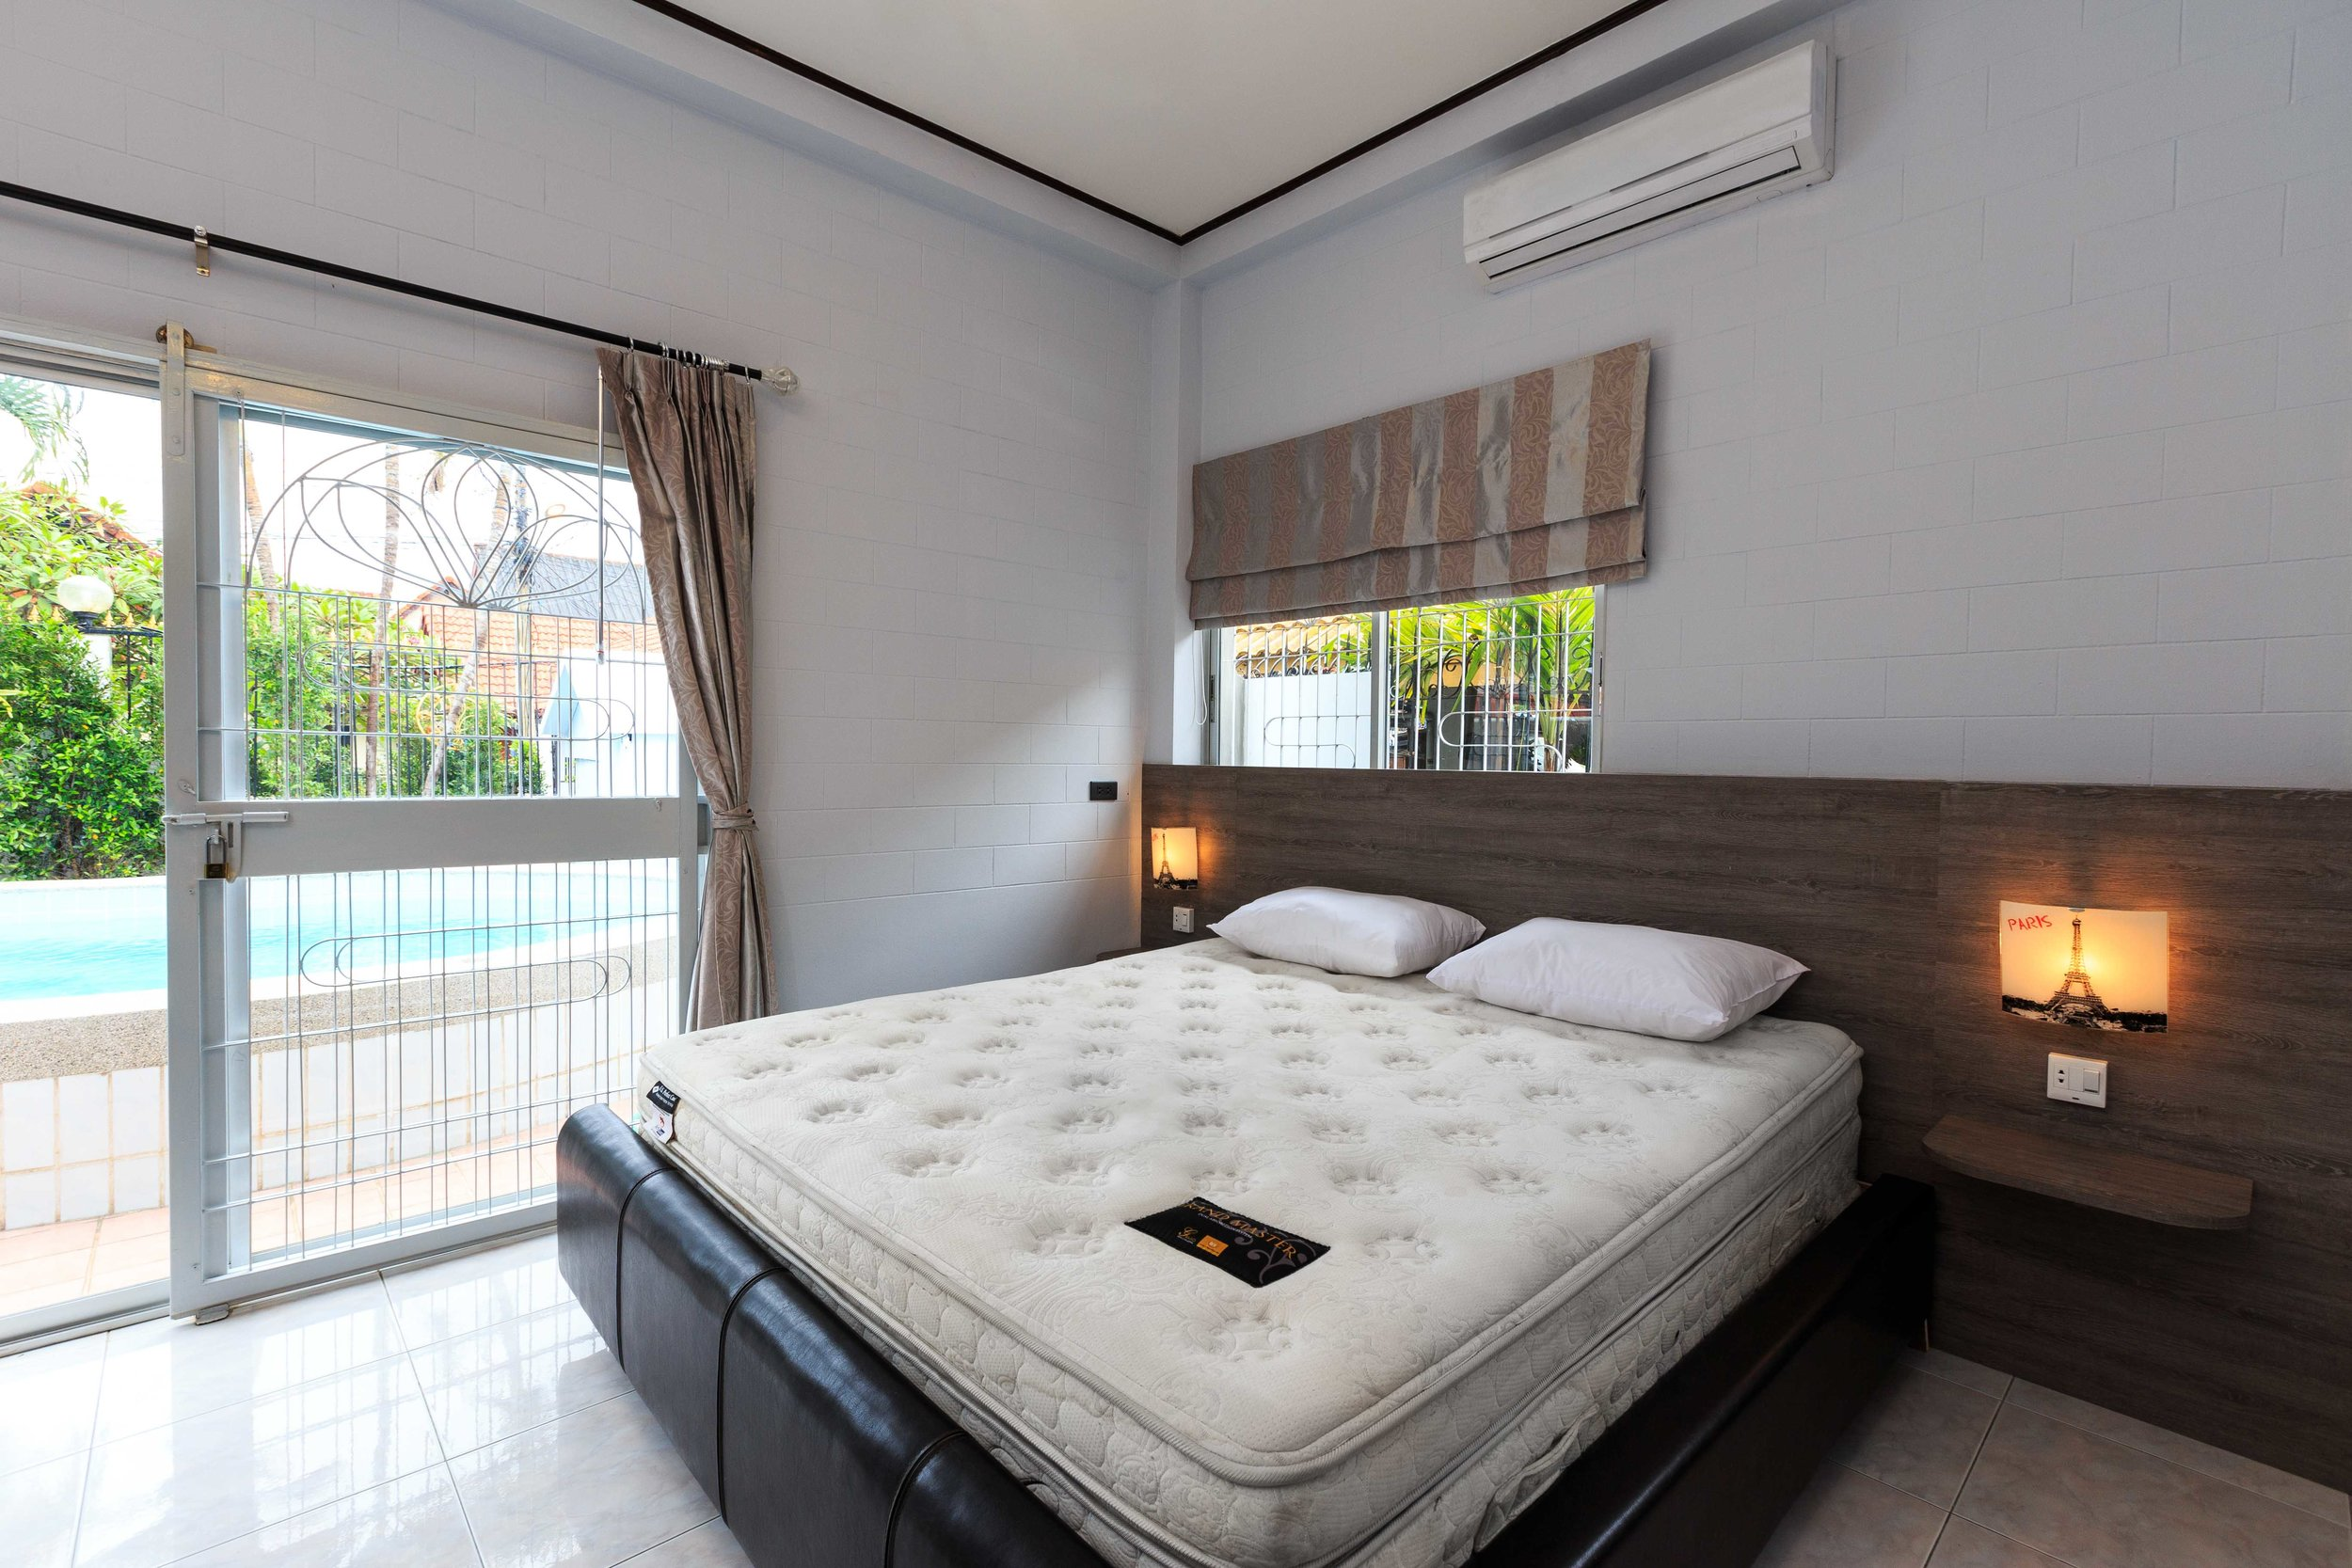 Room01-01.jpg